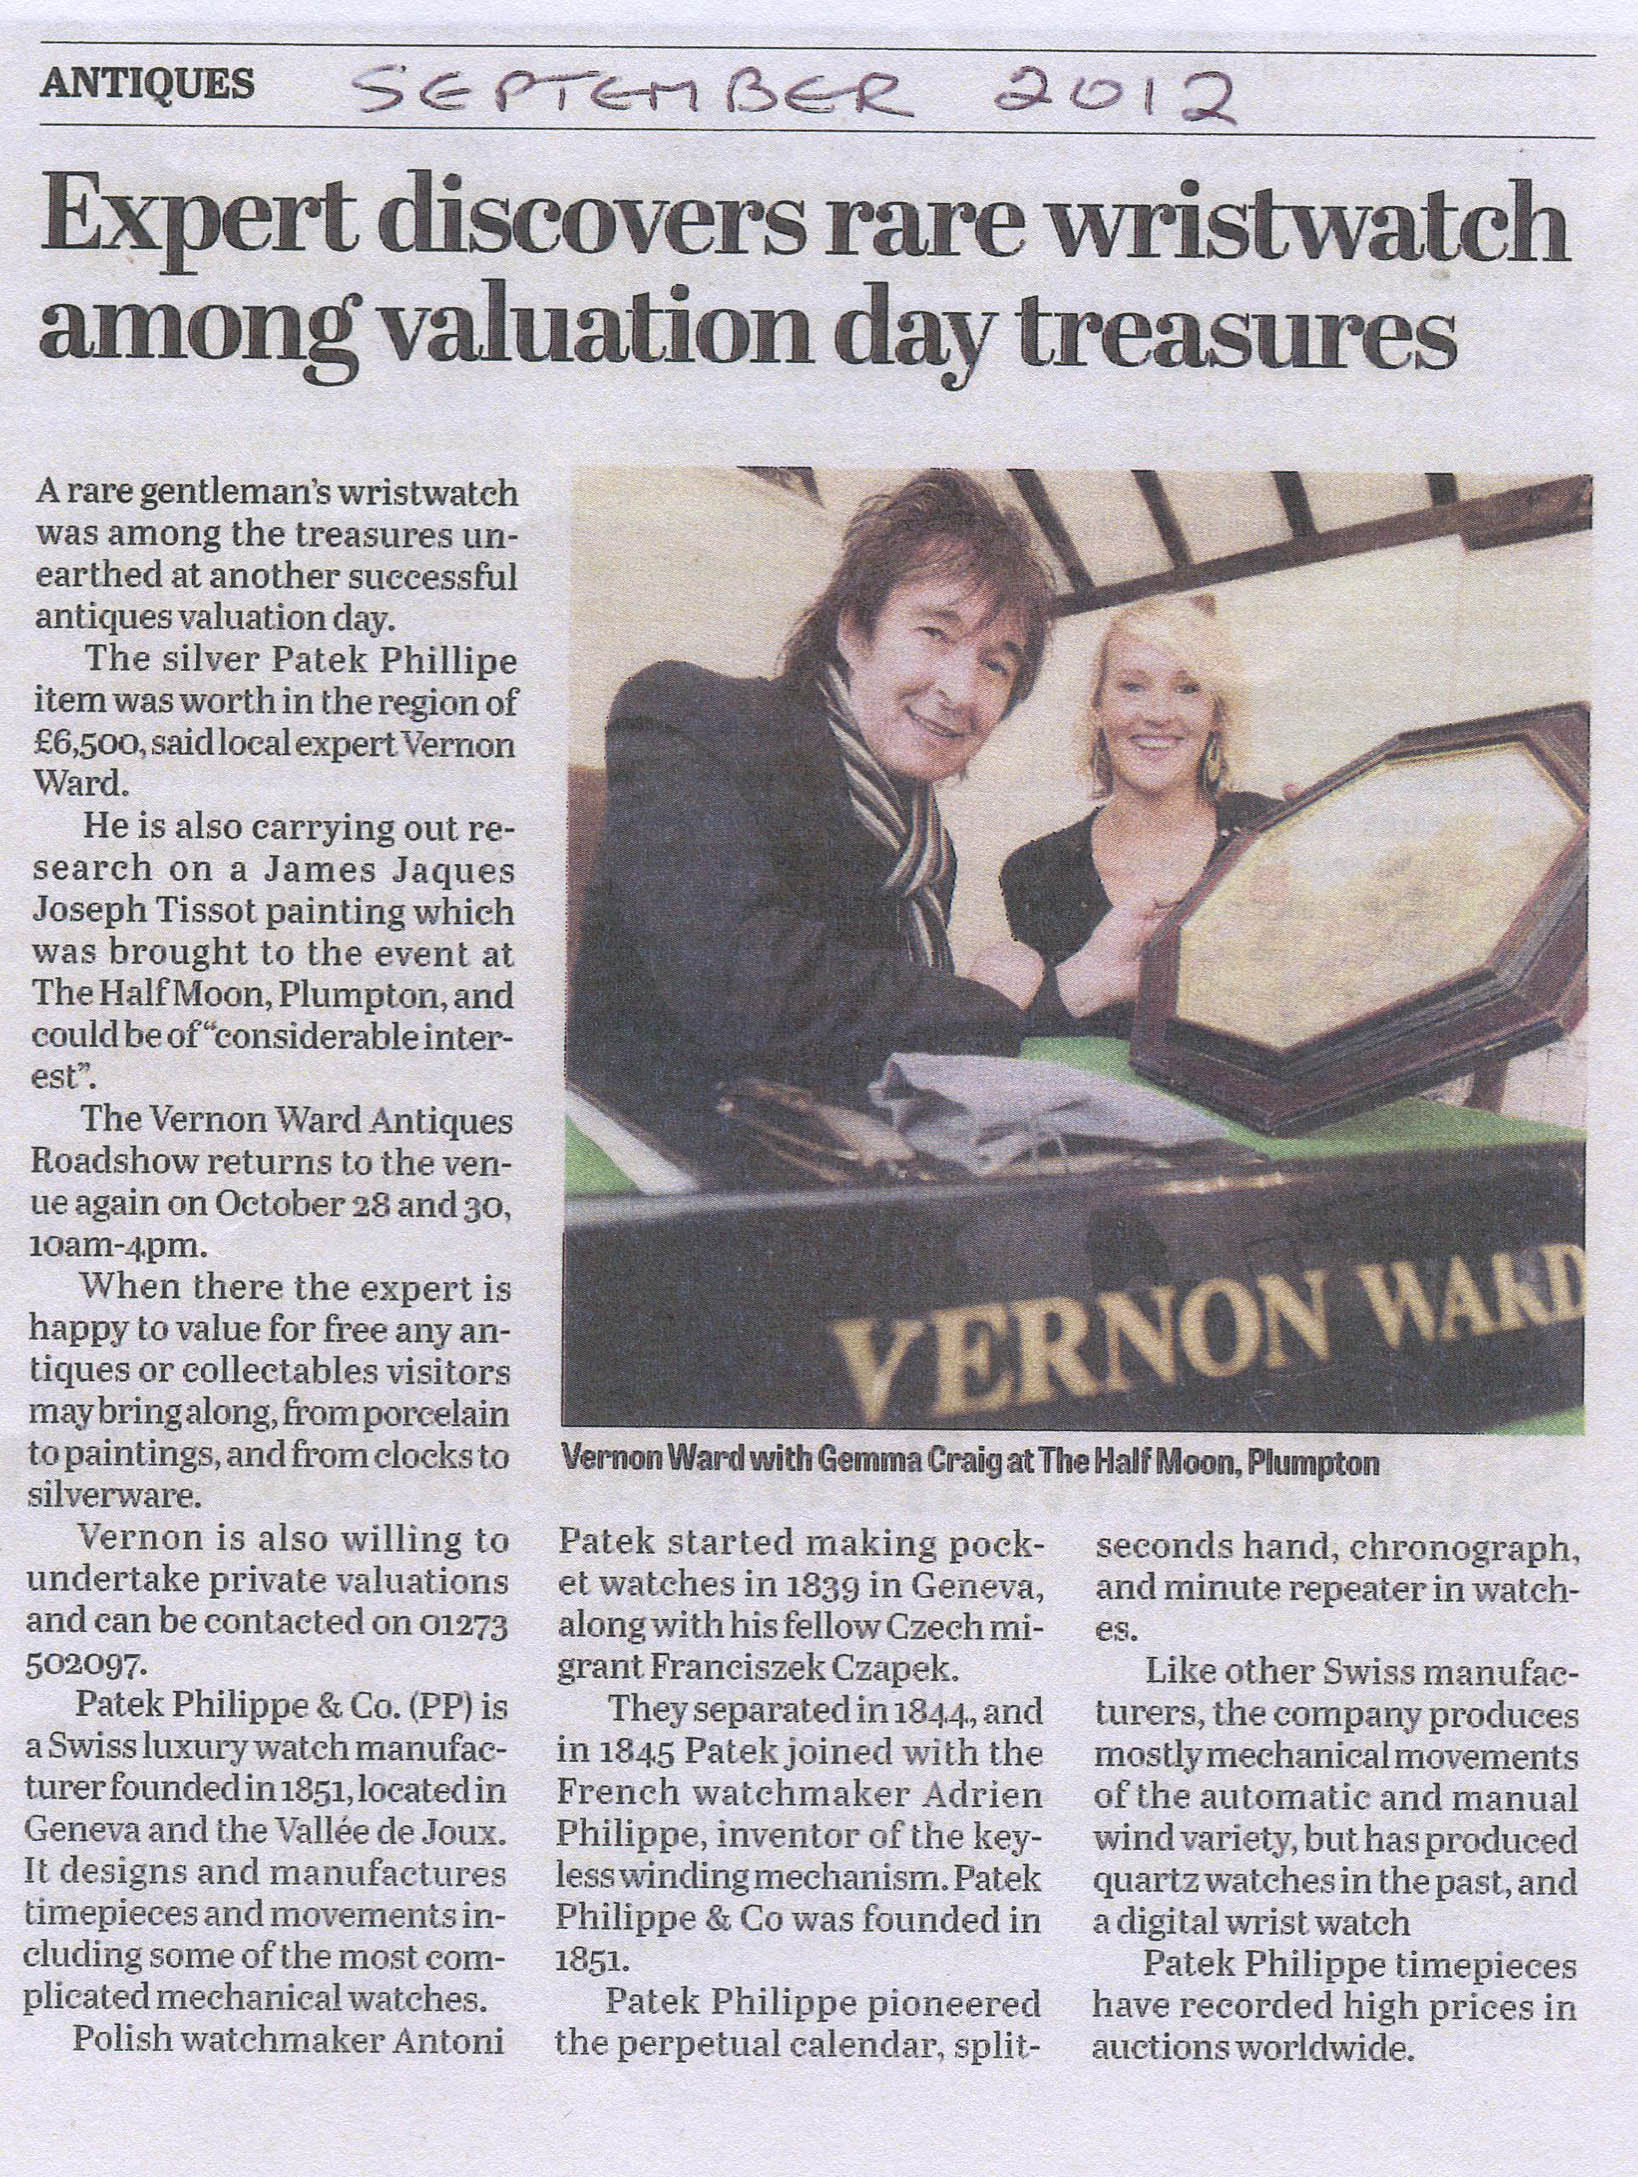 Vernon Discovers Rare Wristwatch